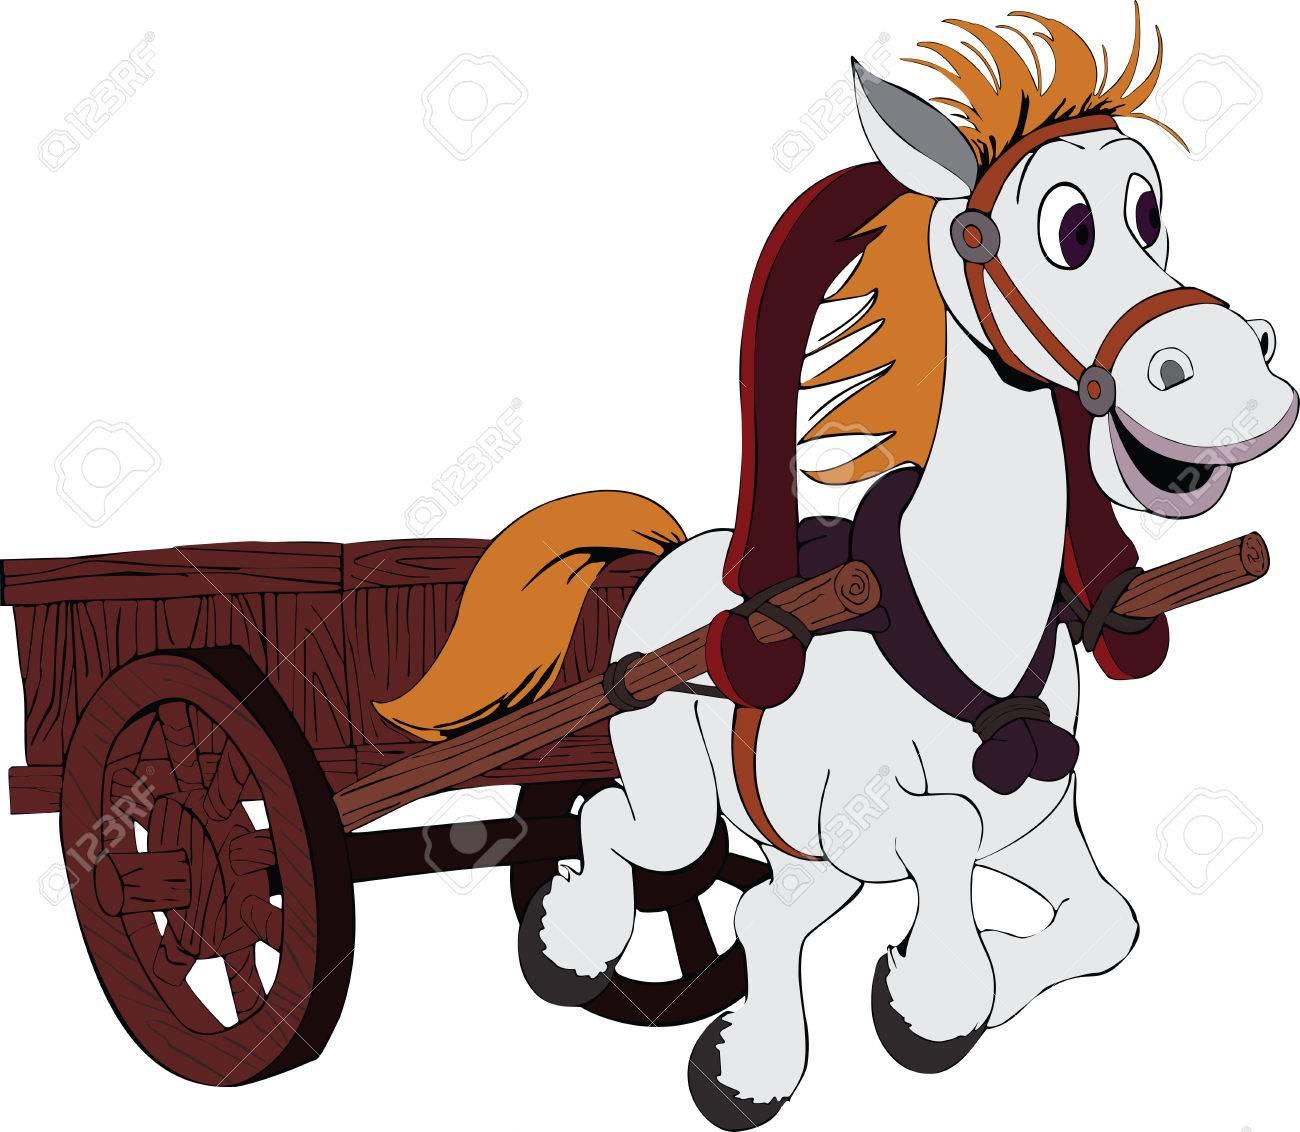 Horse Carriage Cartoon Horse Carriage Illustration